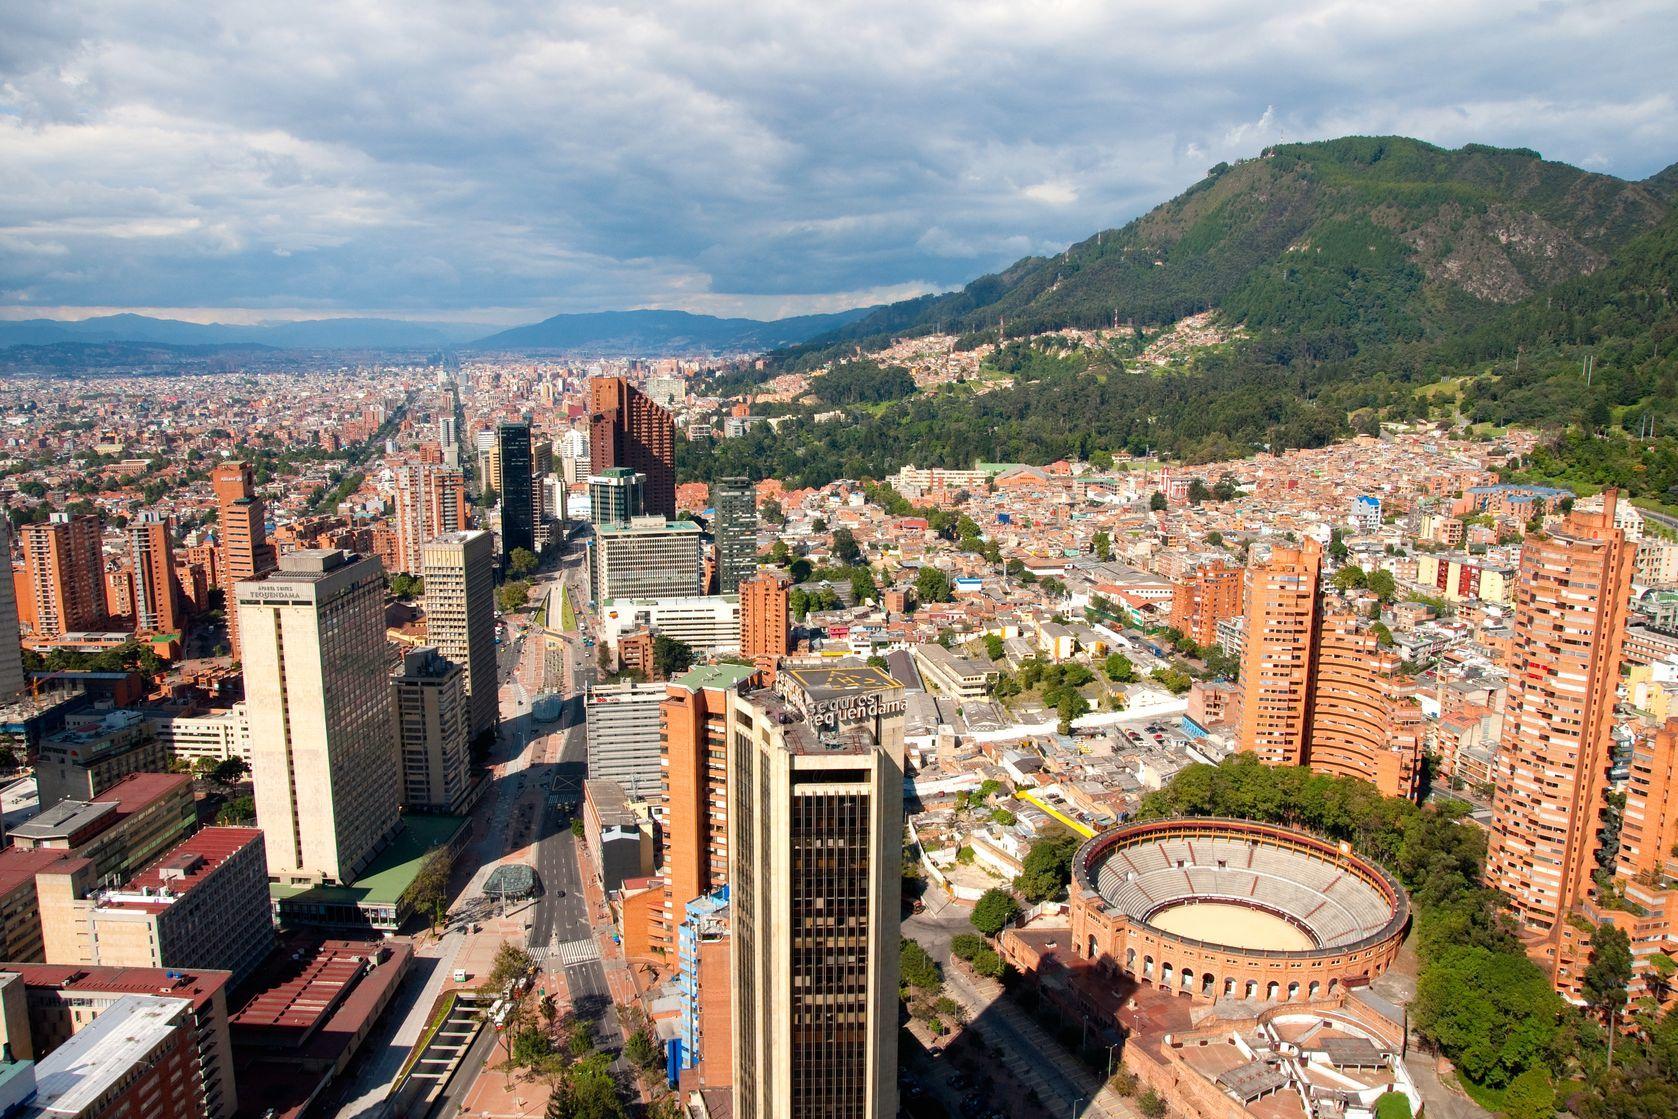 Pohled na Bogotu v Kolumbii | dejonghphotography/123RF.com